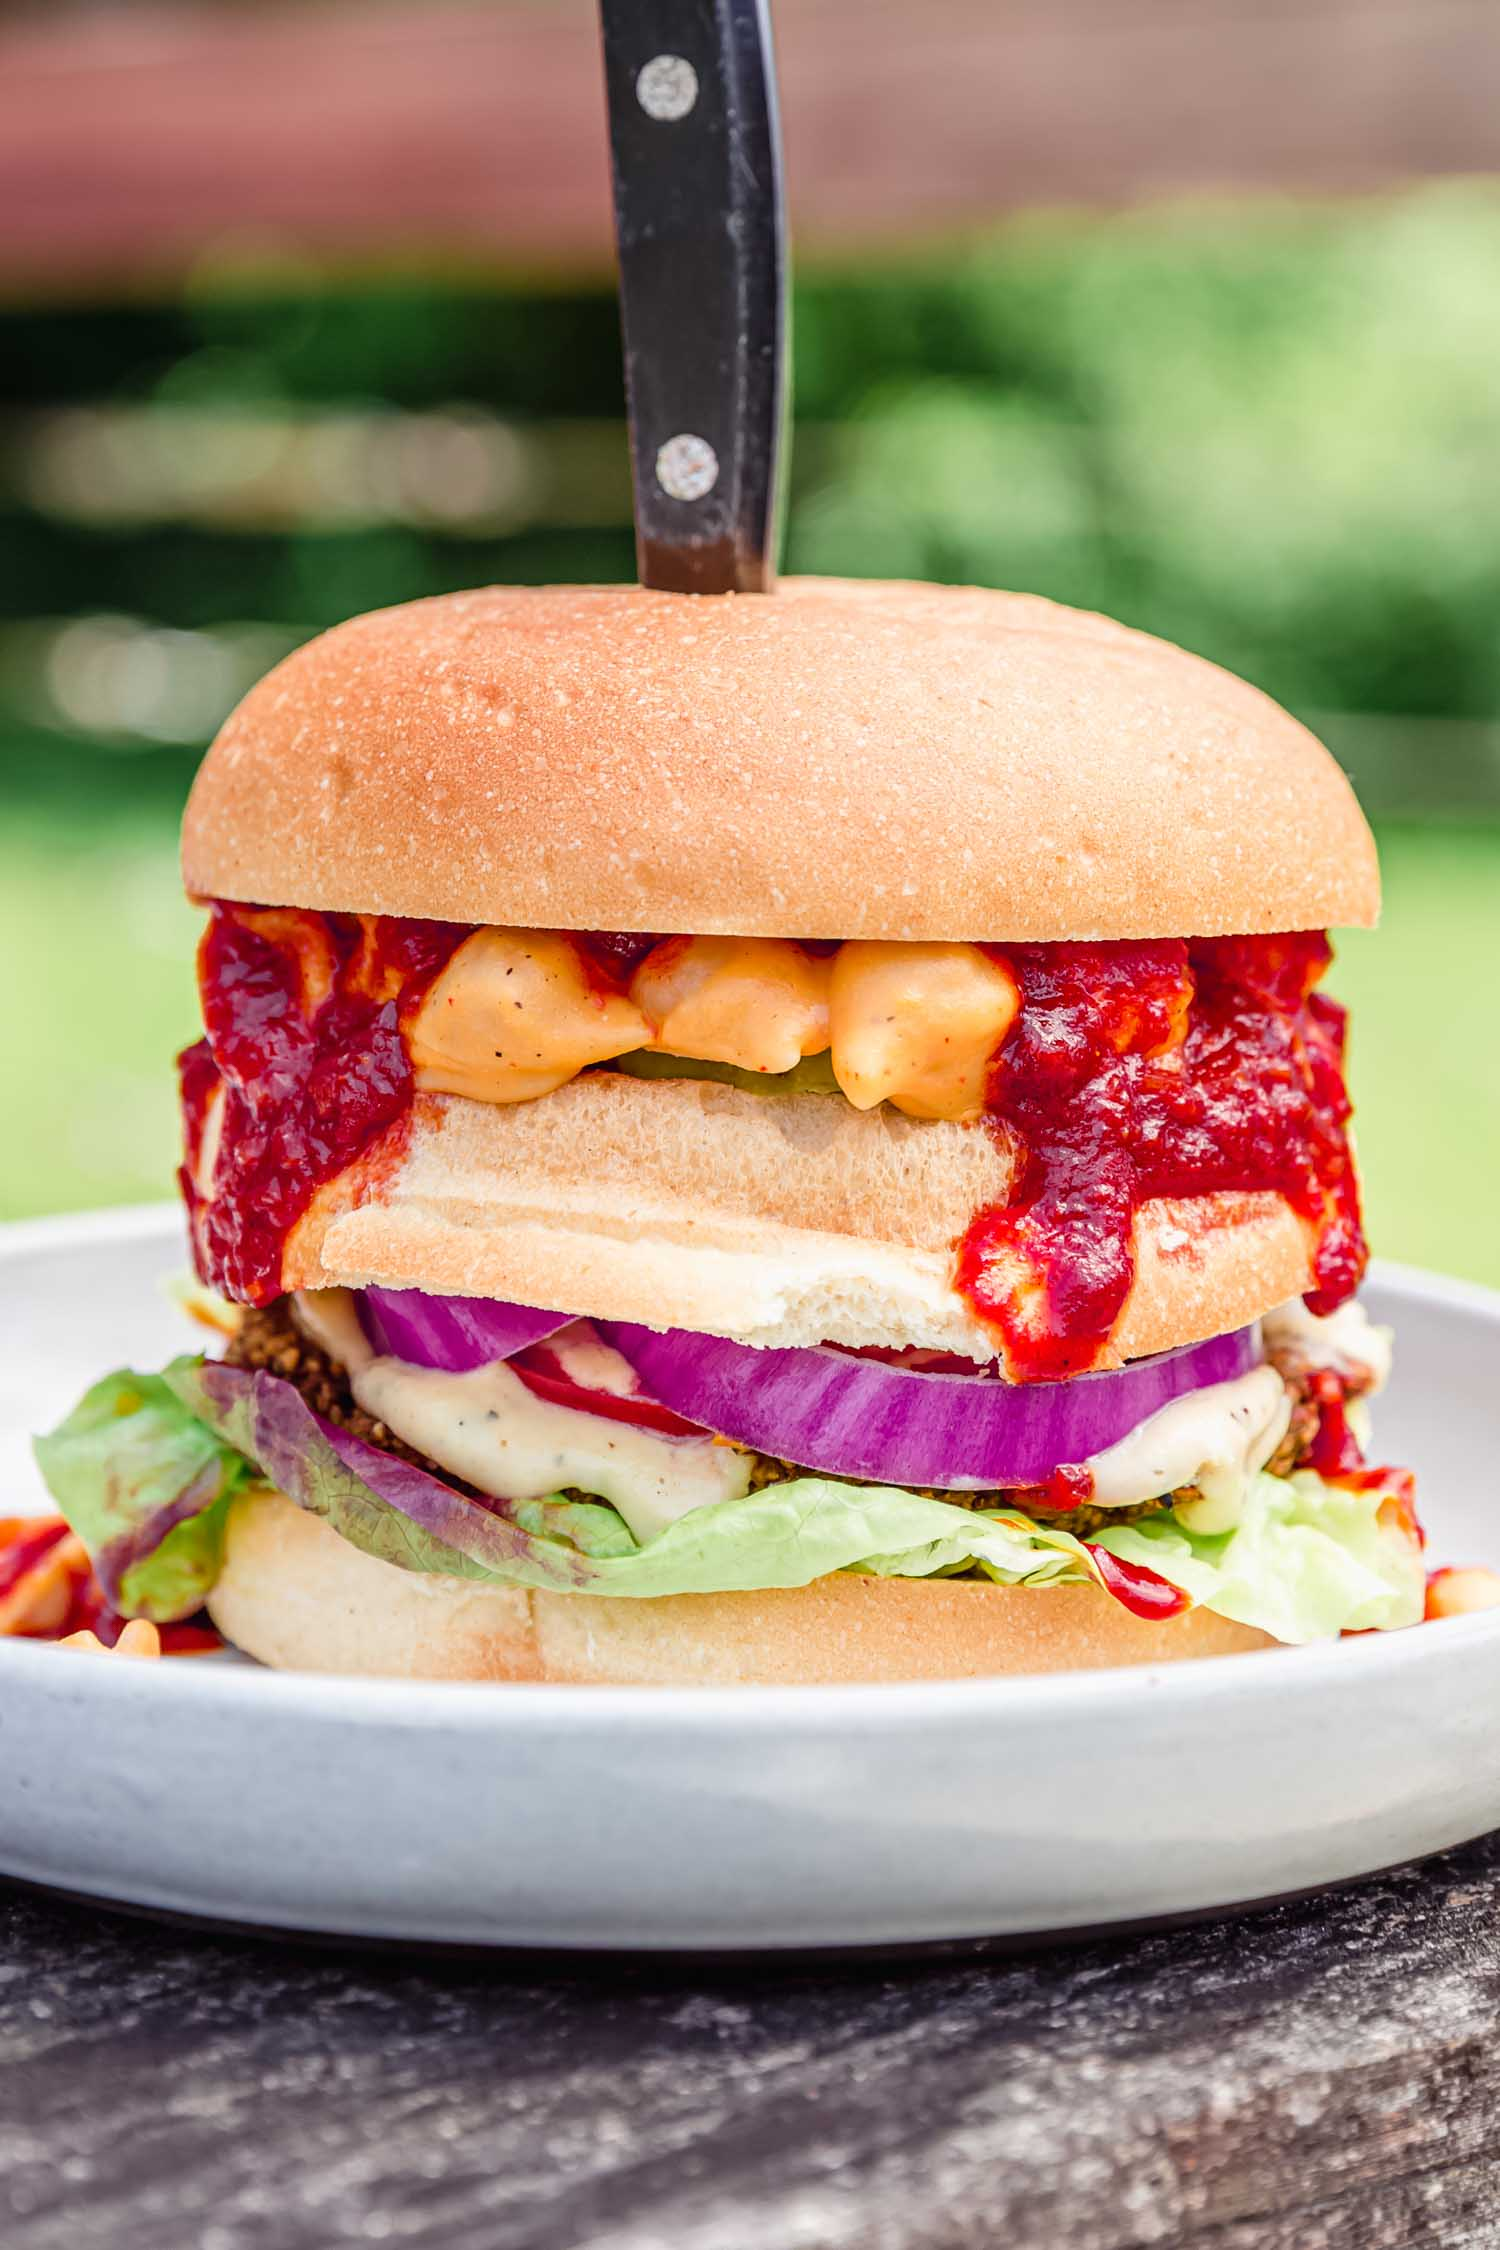 Red BBQ Sauce from  Epic Vegan  by Dustin Harder. Photo by Kari of Beautiful Ingredient. #bbqsauce #bbq #bbqsaucerecipe #vegansauce #veganbbq #vegansummerrecipe #veganrecipe #epicvegan